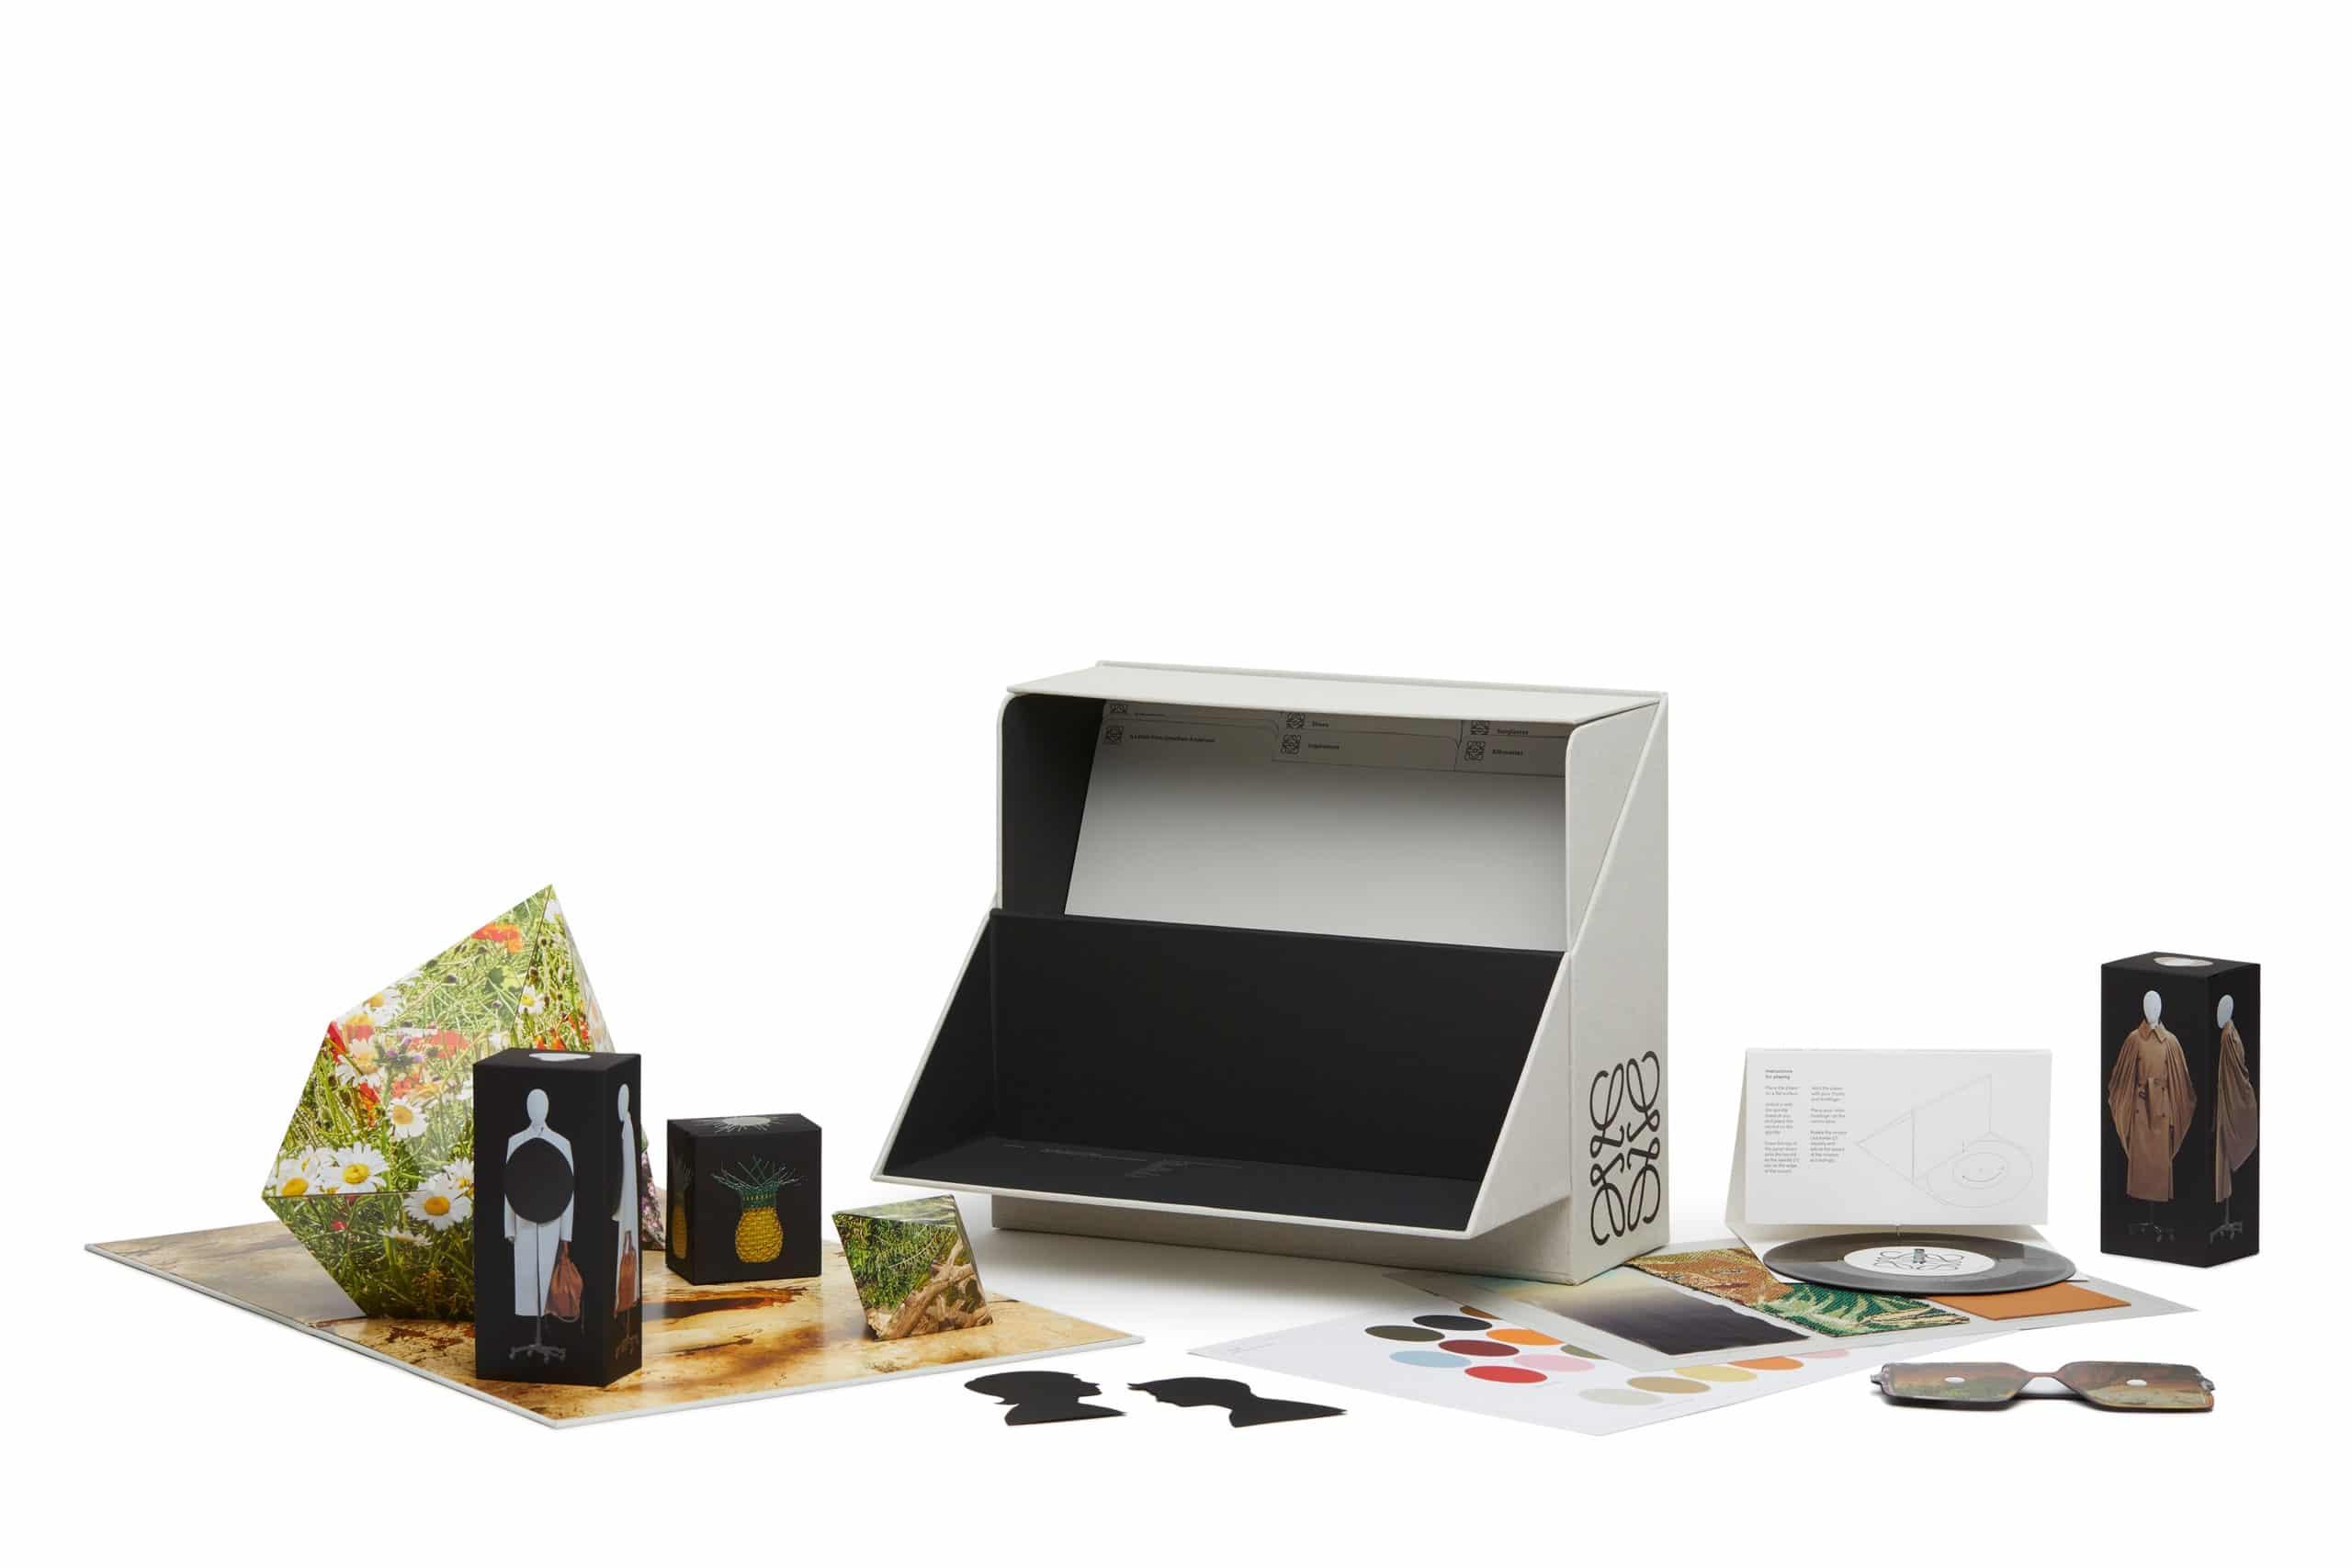 Loewe Show-in-a-Box